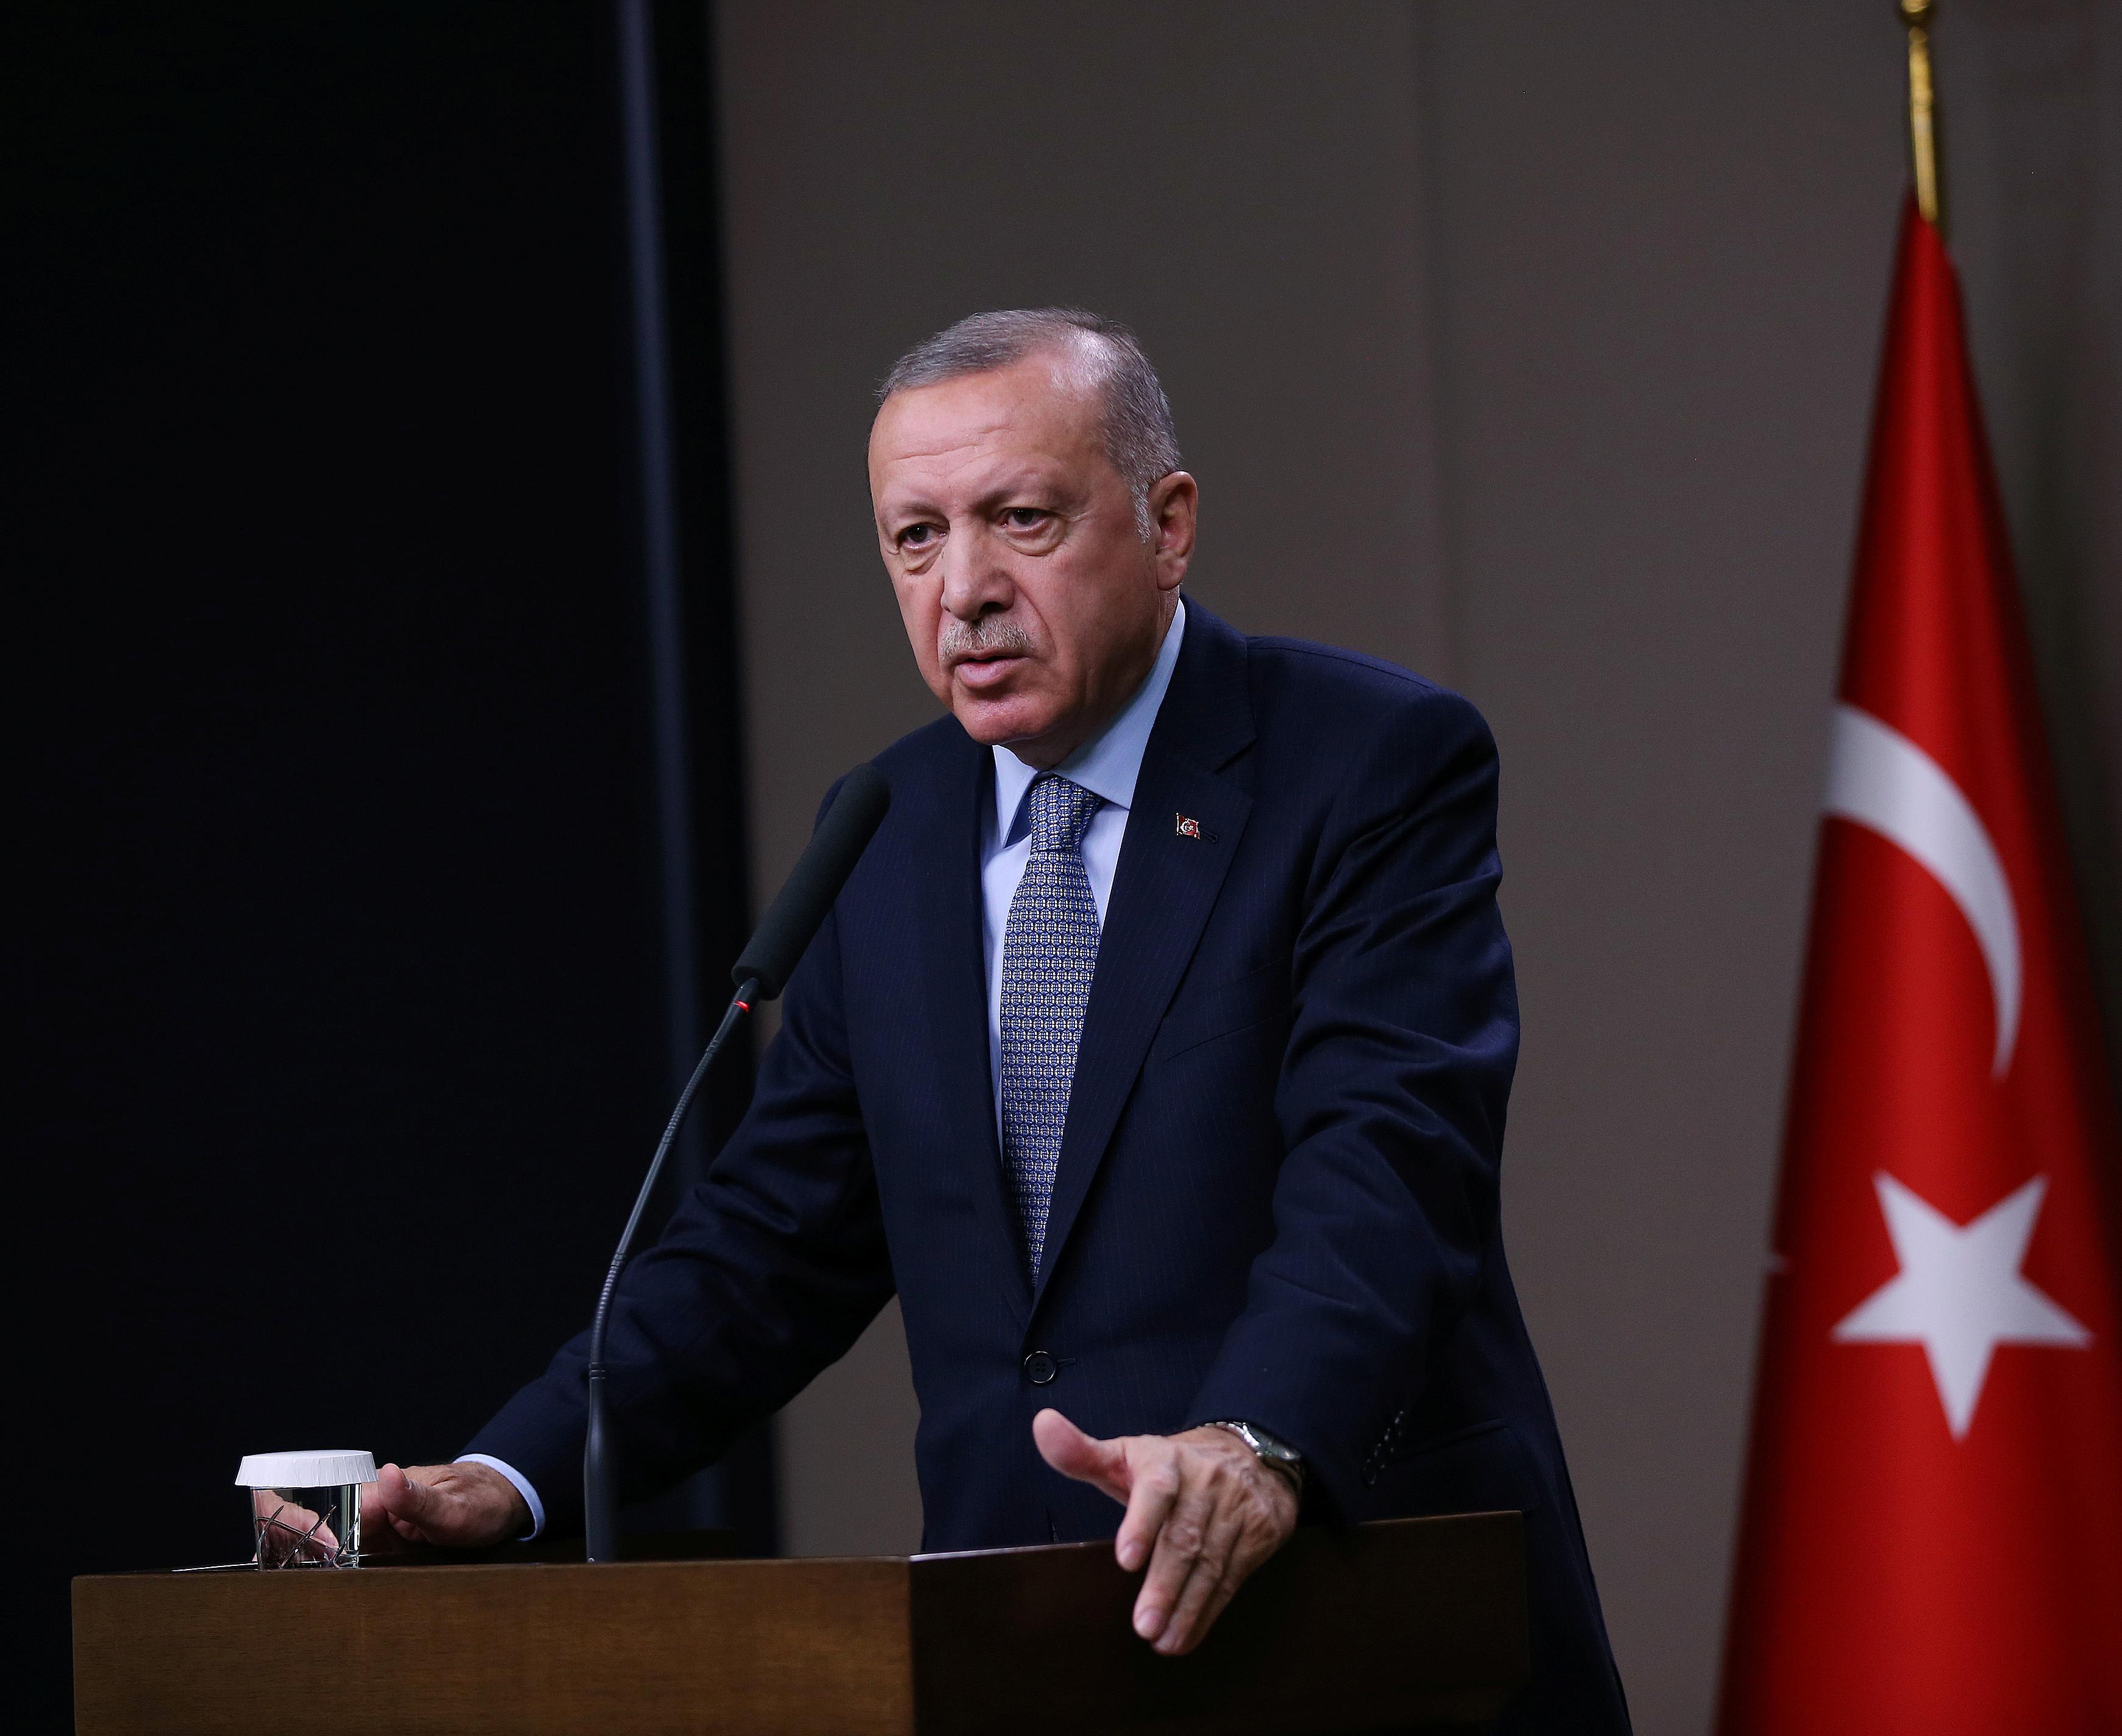 Turkey will resume Syria assault if U.S. promises not met: Erdogan